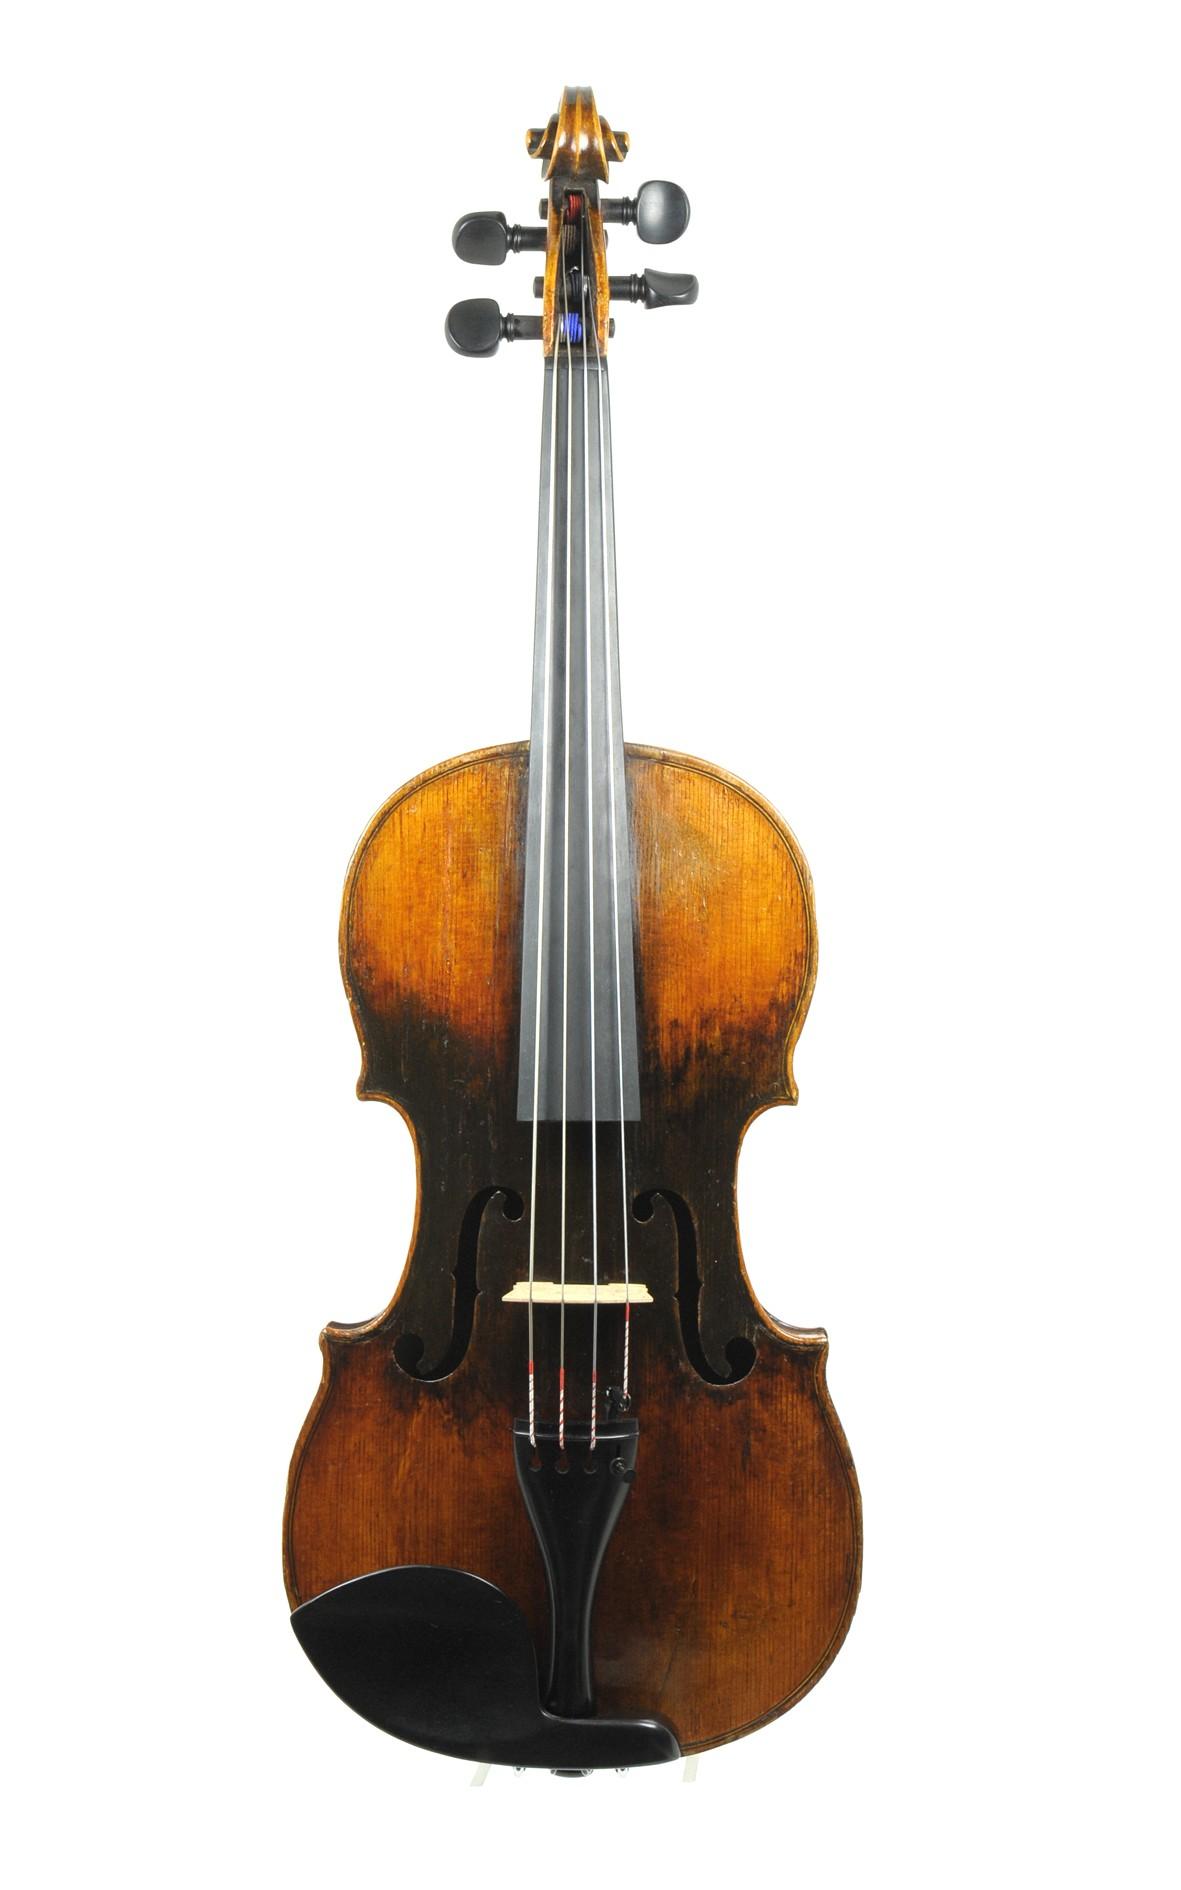 Petite French viola, 19th century - top